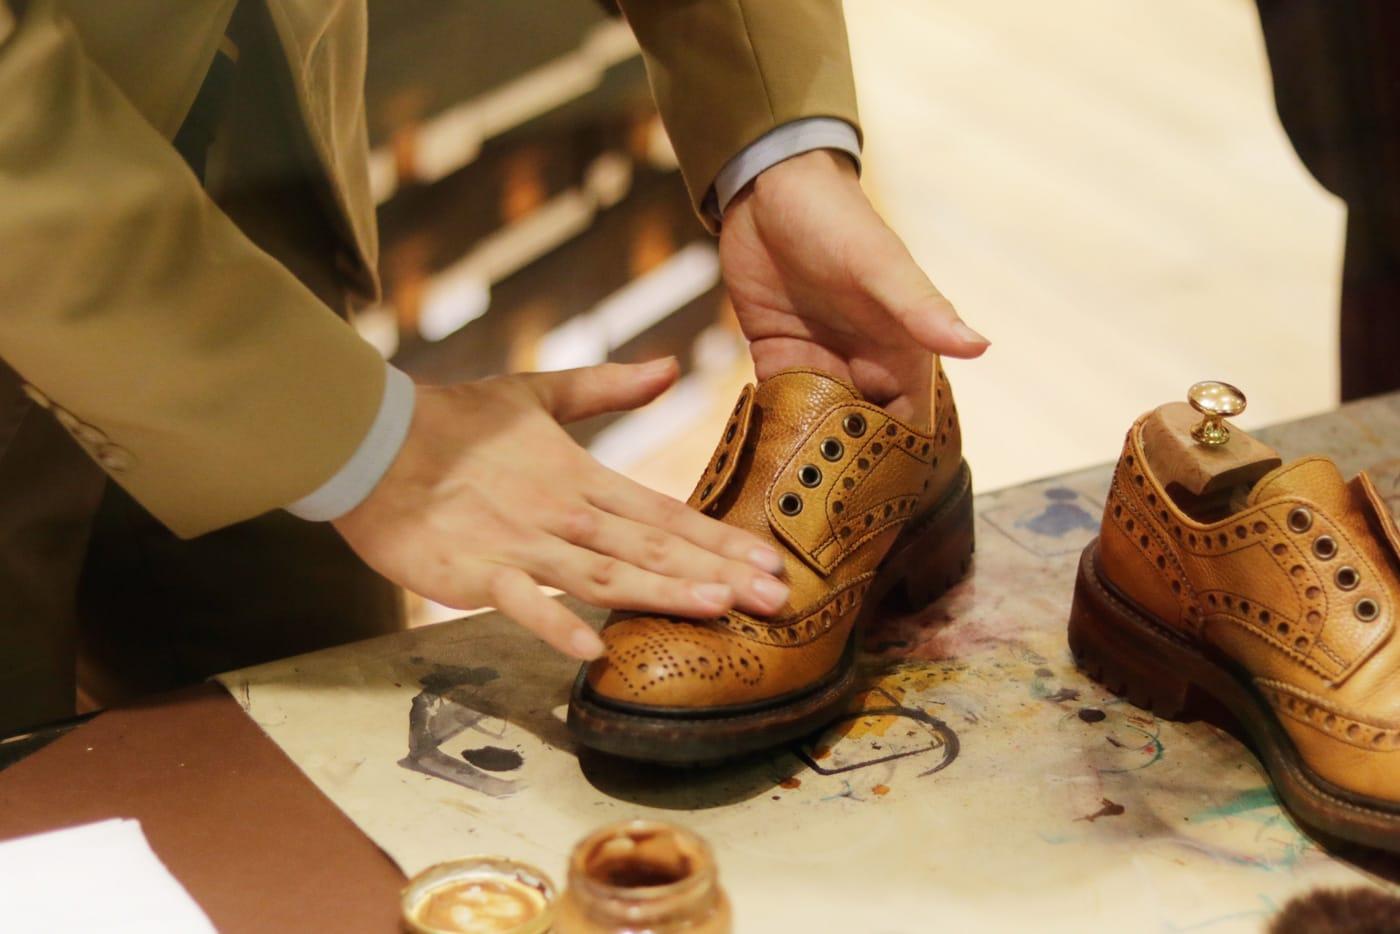 Y's Shoeshine 杉村氏とのコラボレーションライブ配信